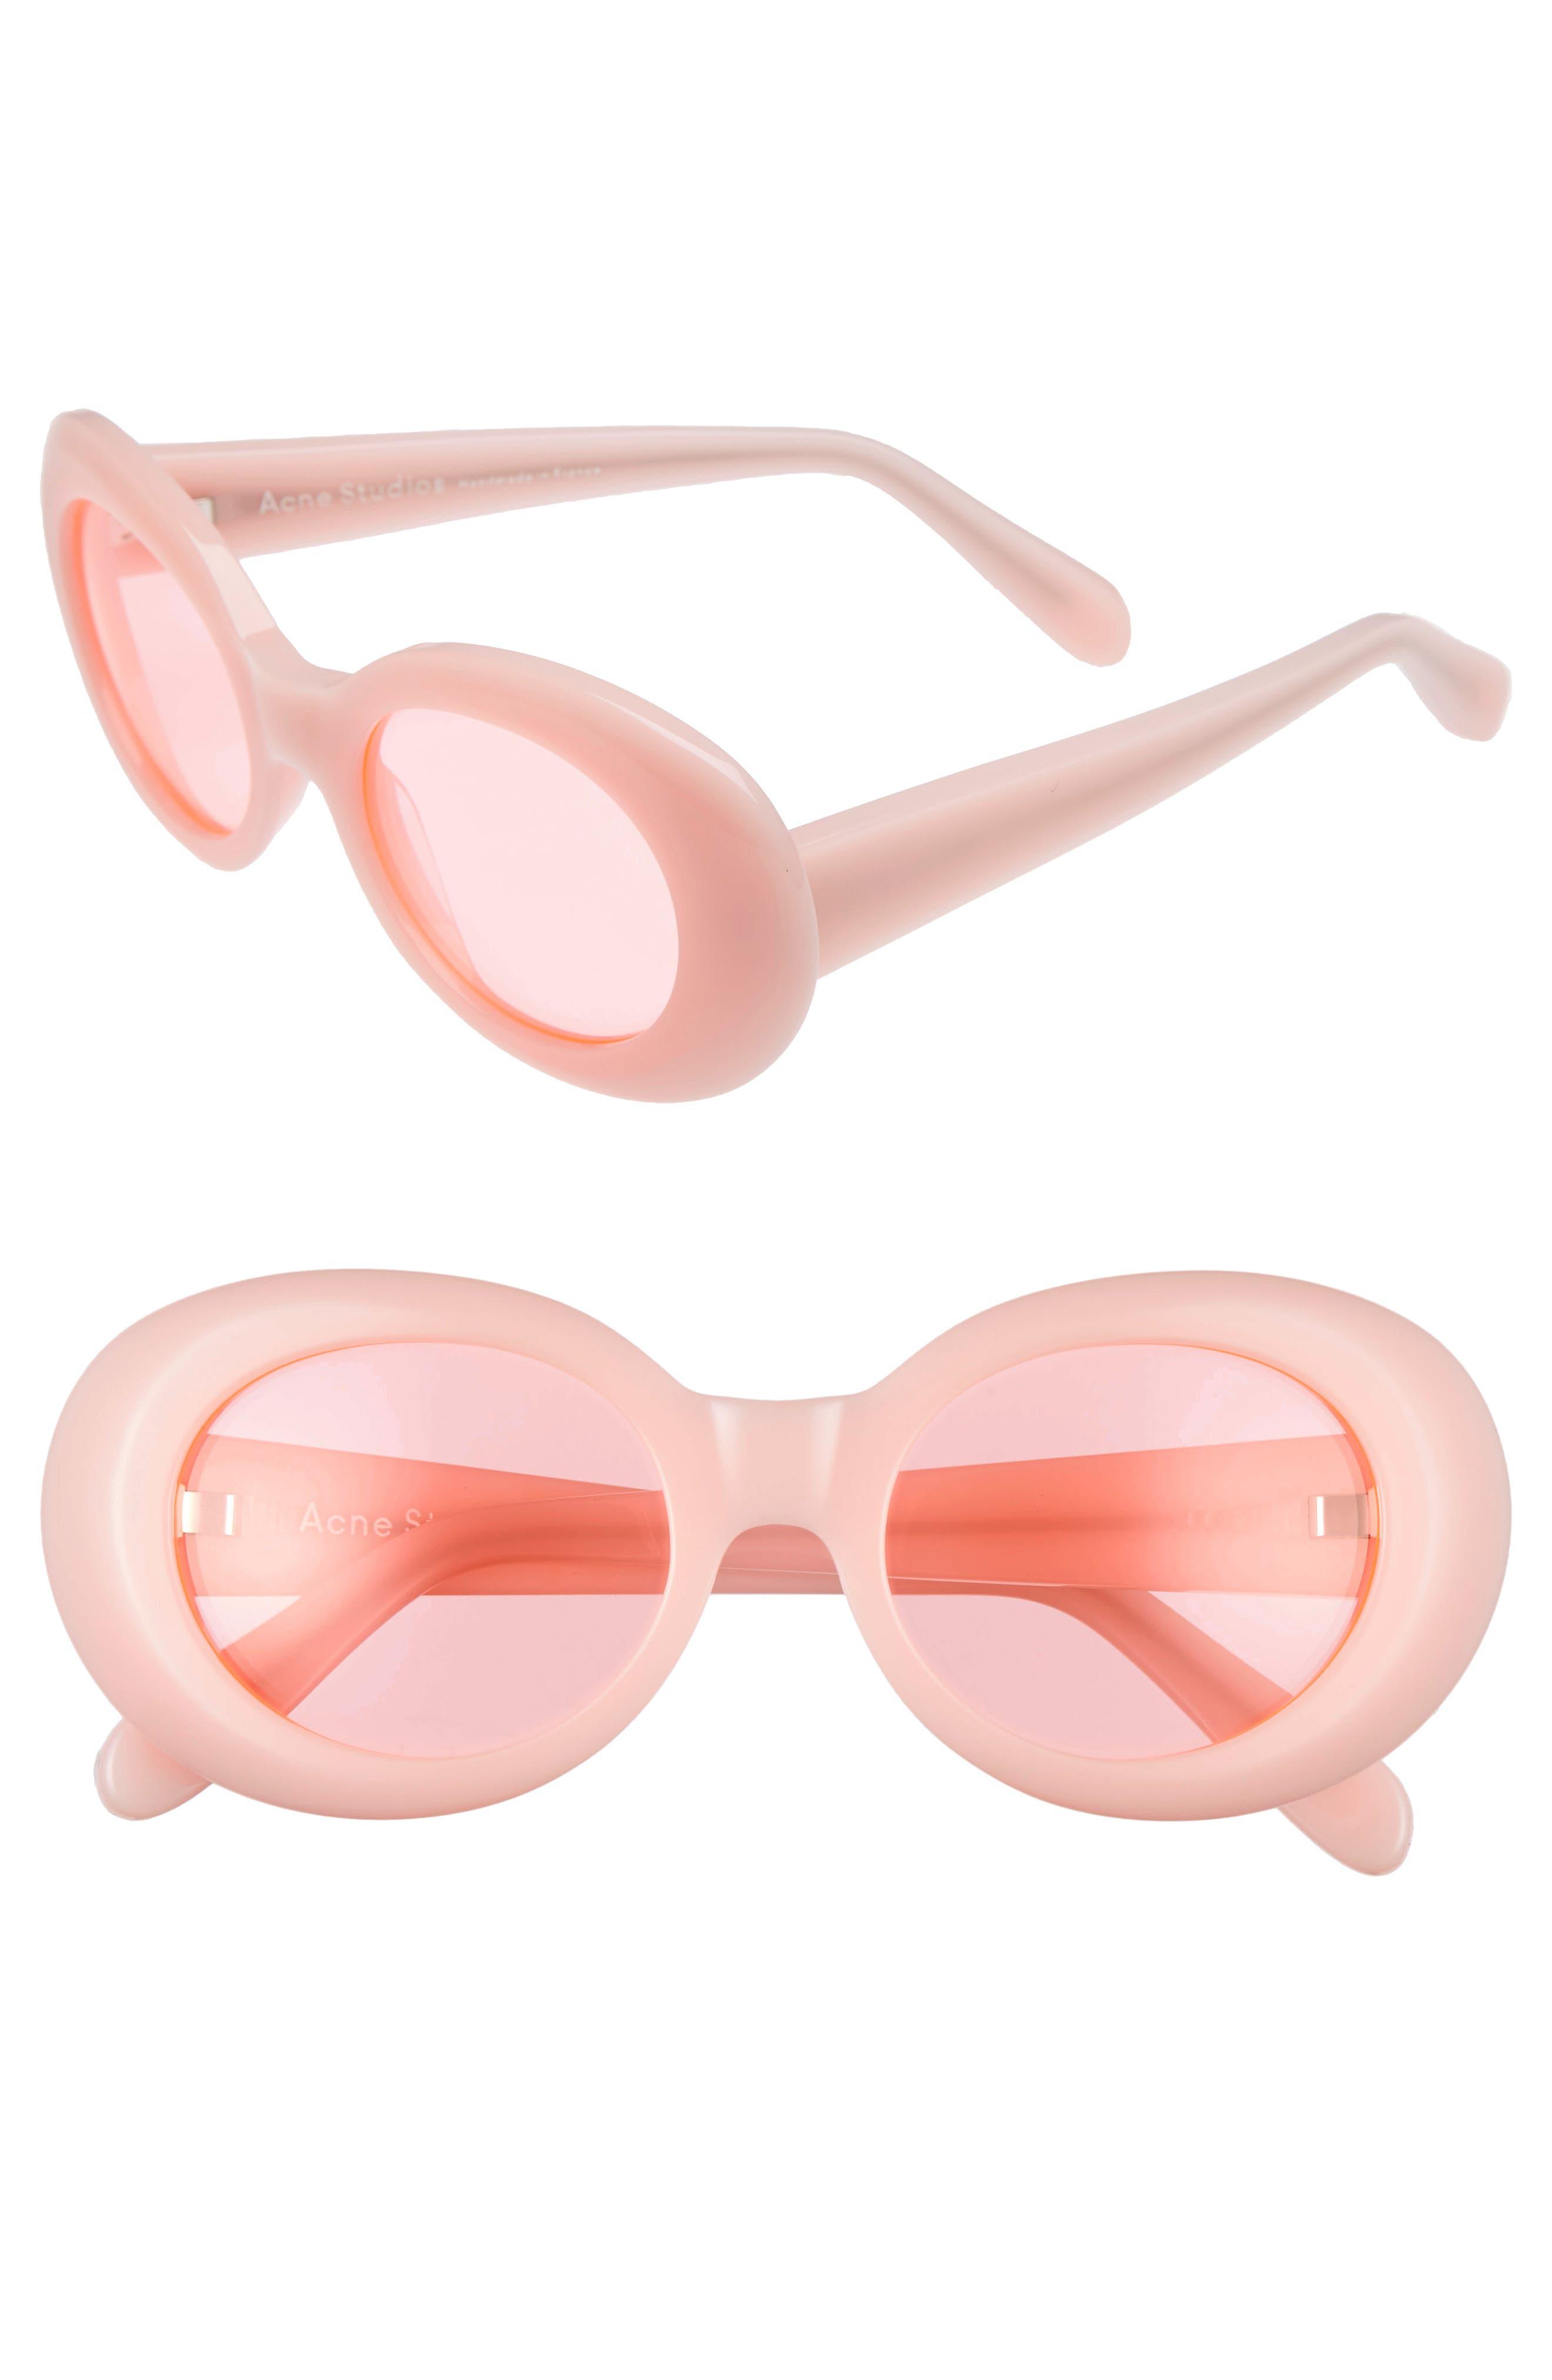 Mustang 47mm Oval Sunglasses,                             Main thumbnail 2, color,